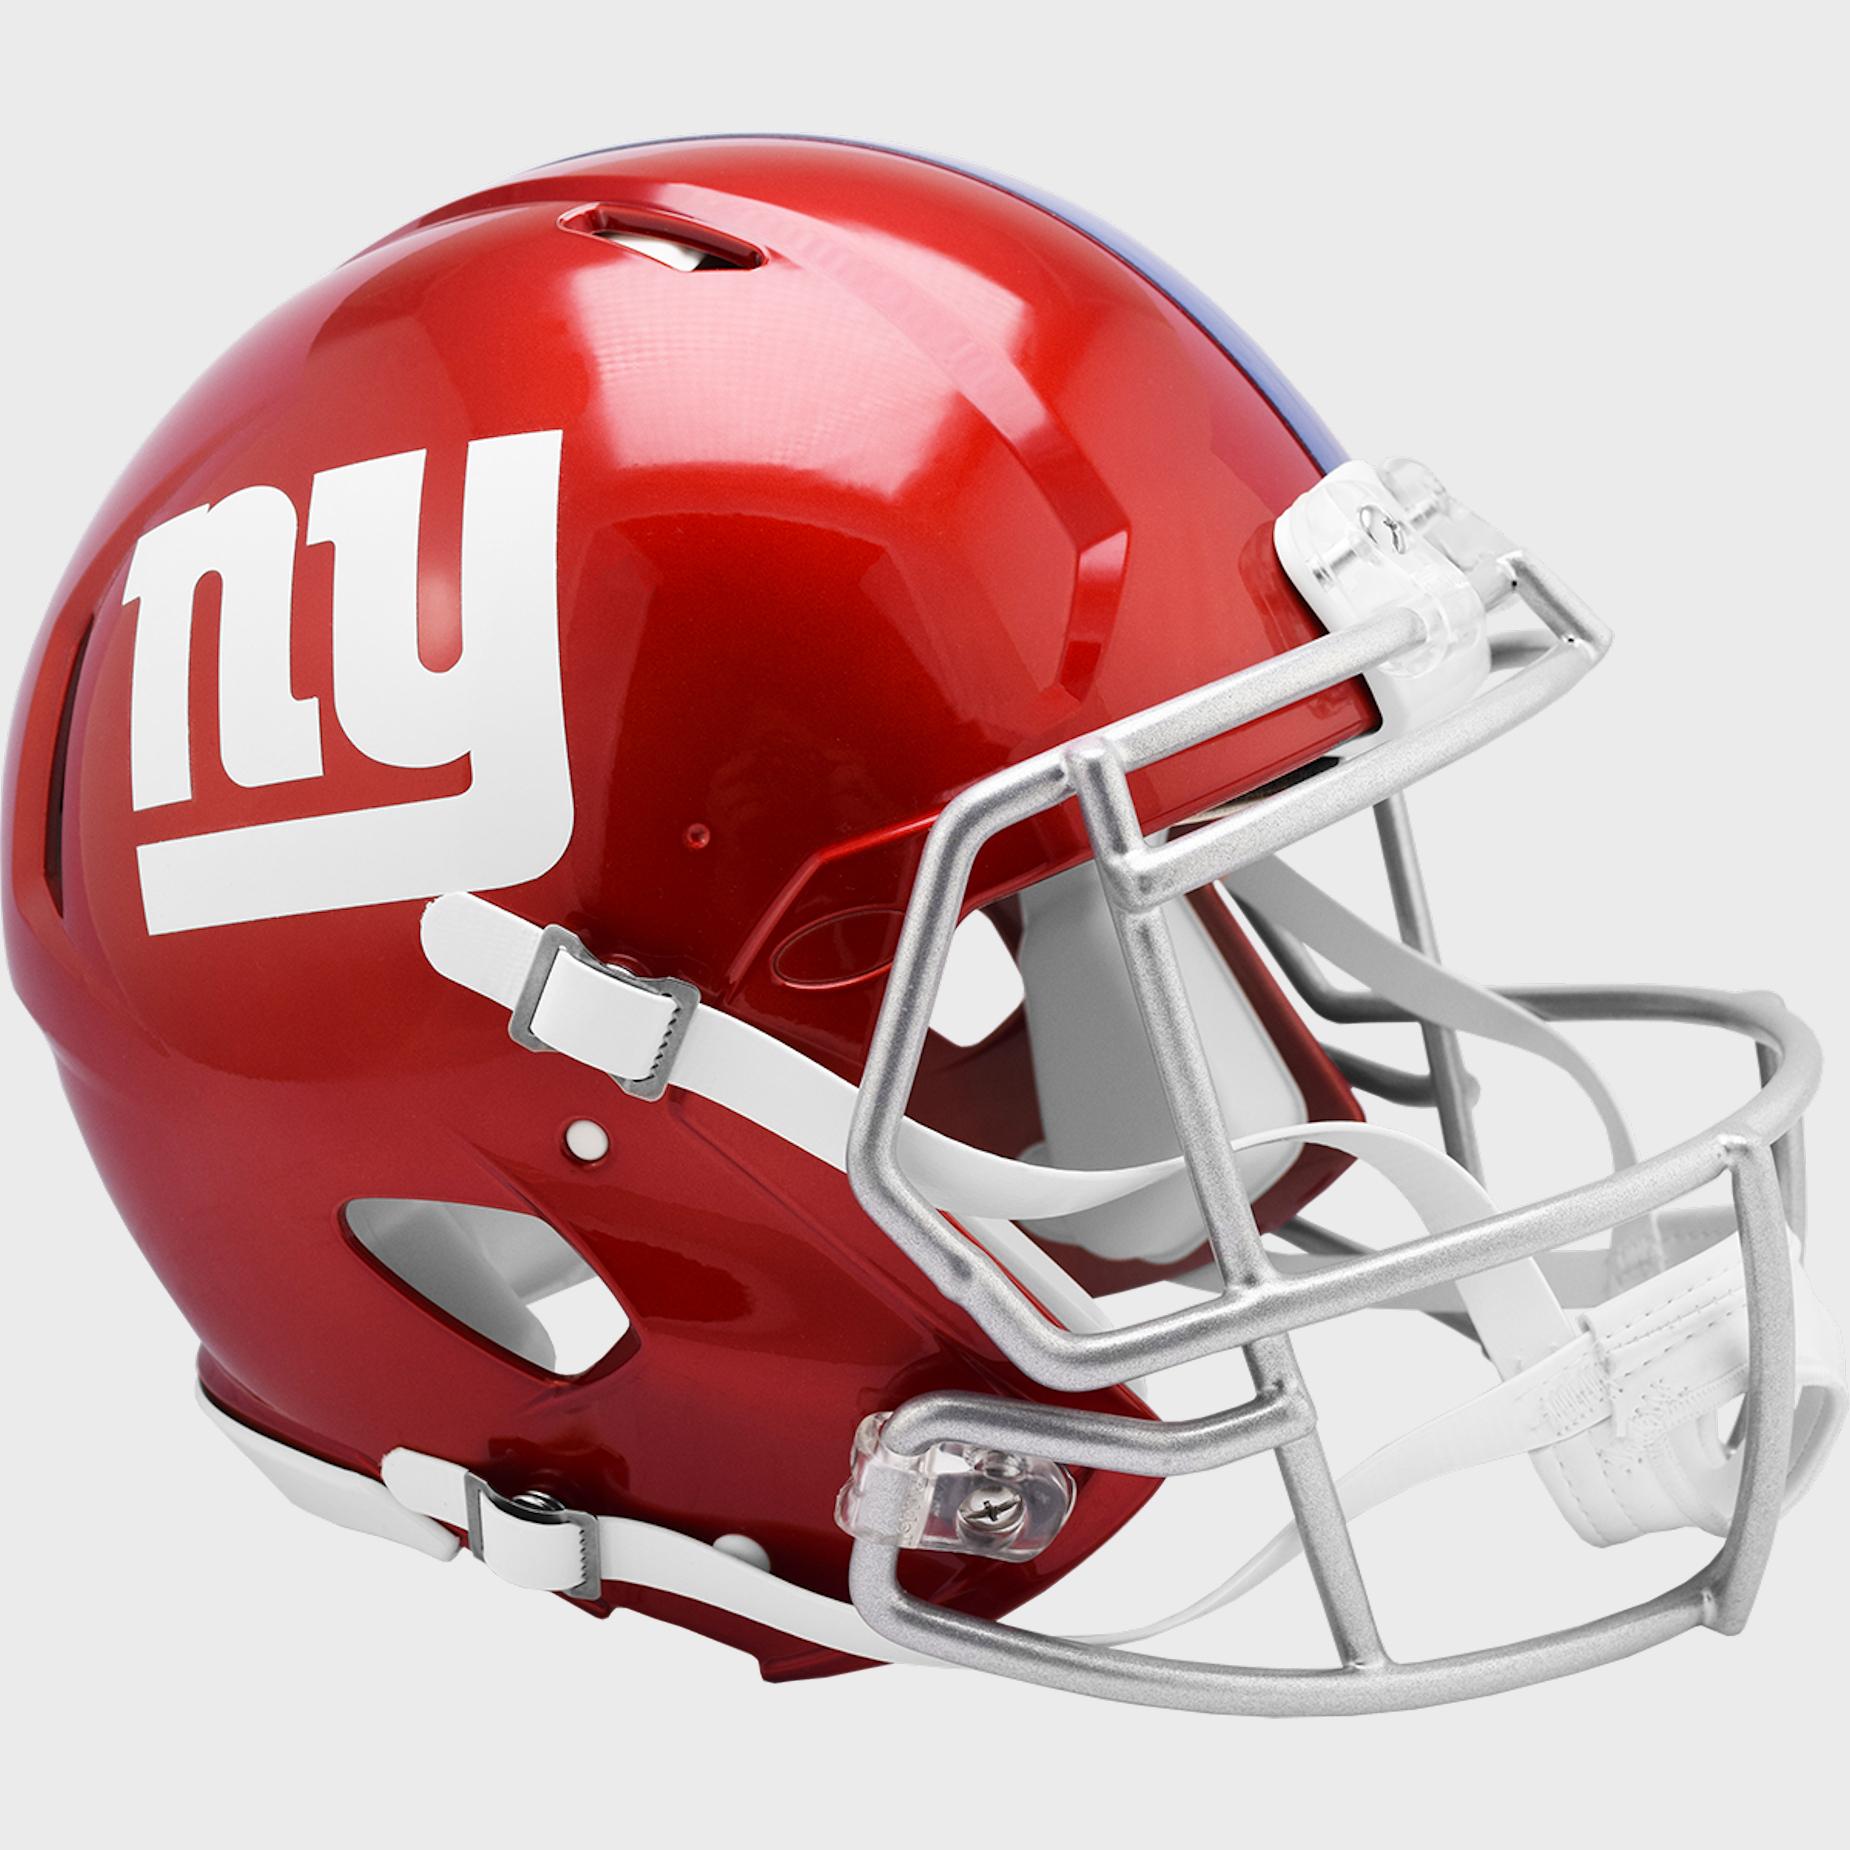 New York Giants Speed Football Helmet <B>FLASH ESD 8/21/21</B>